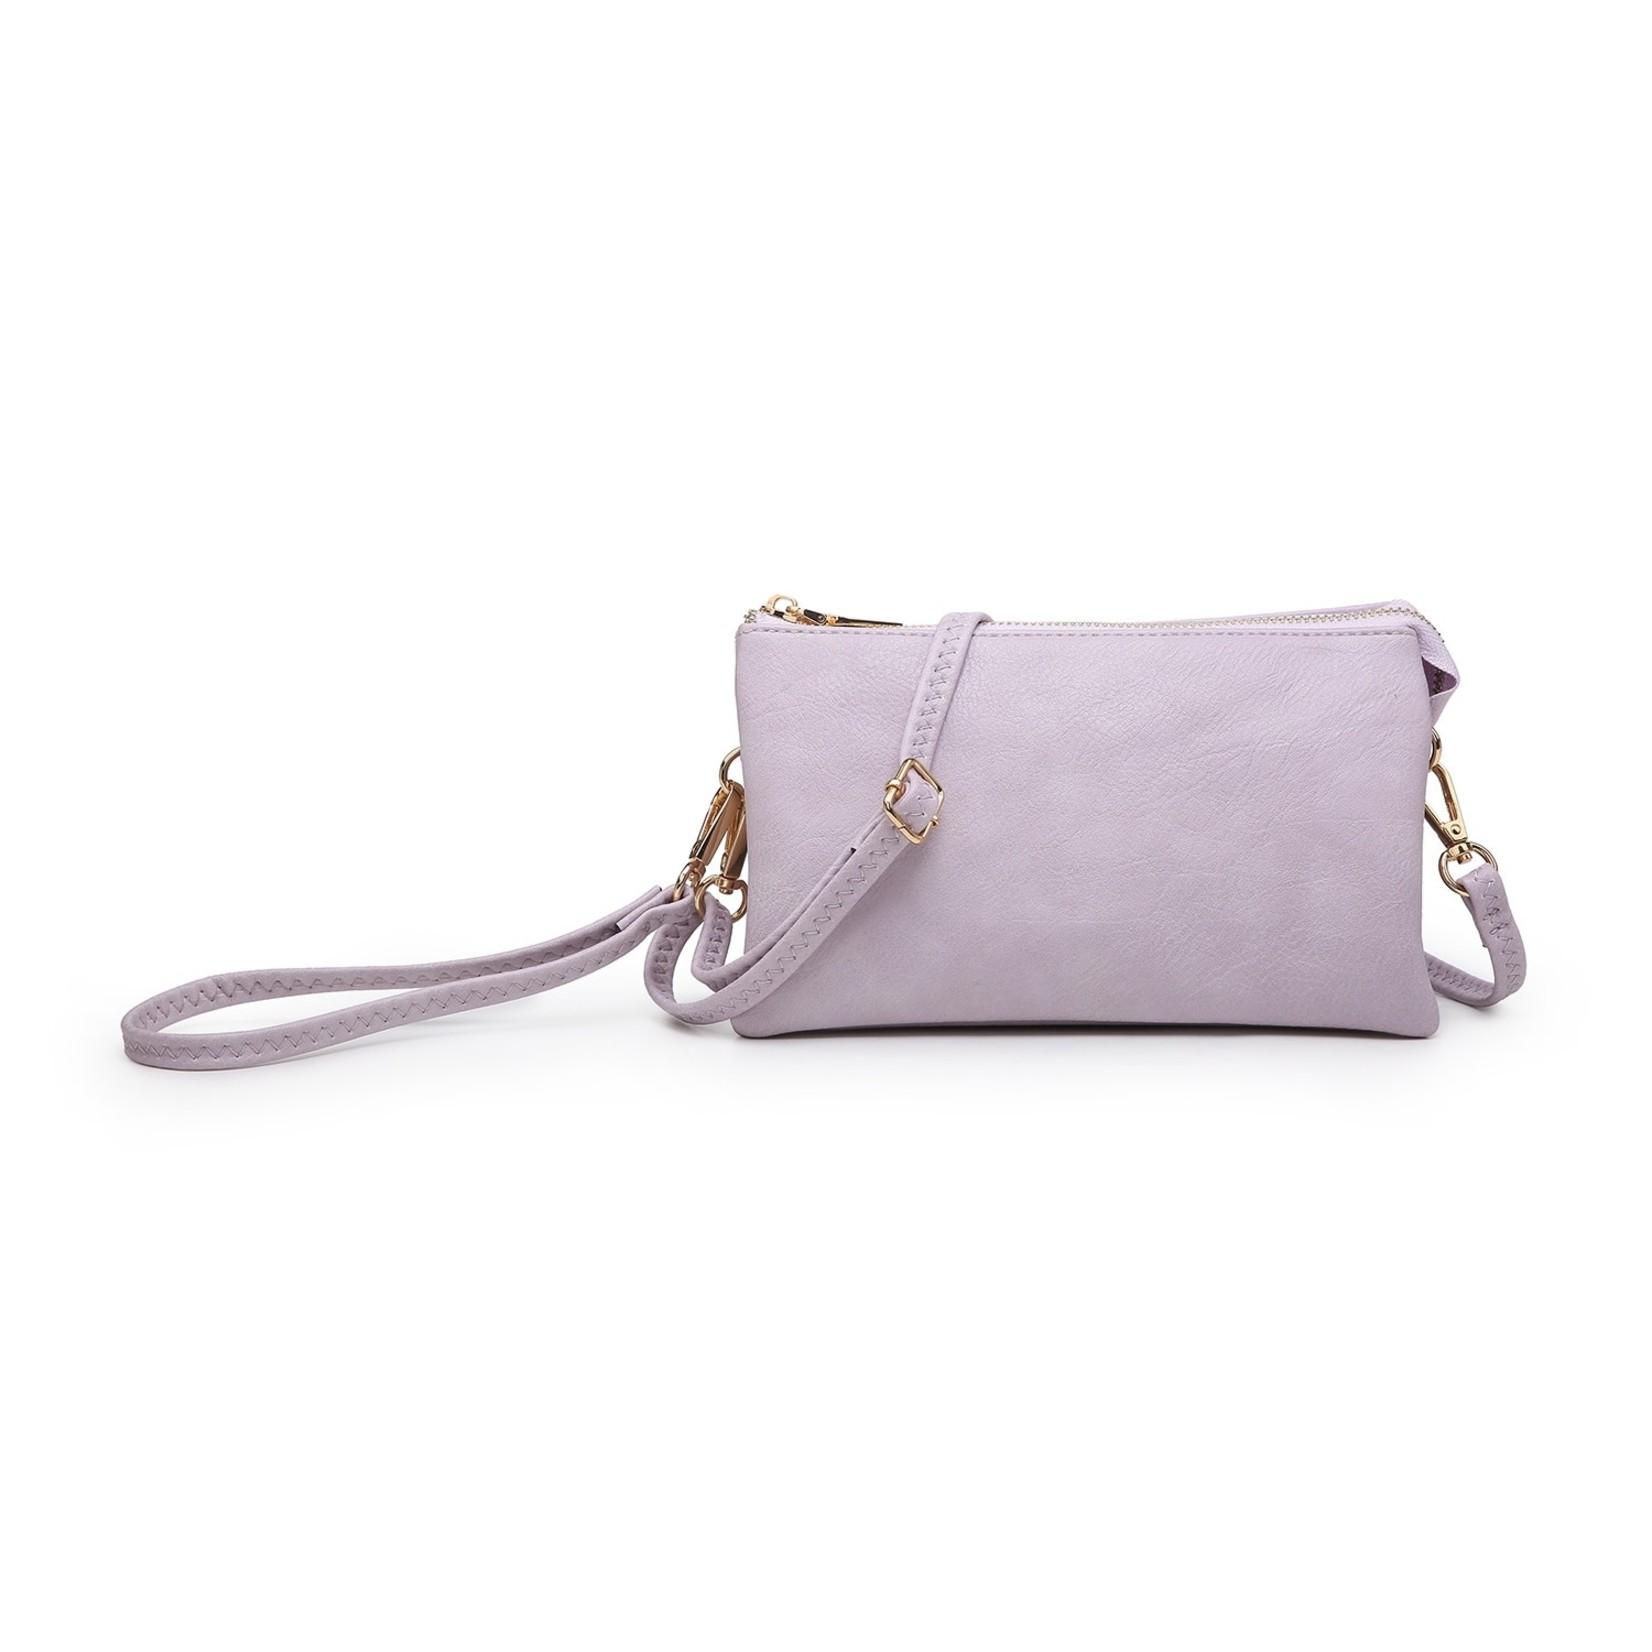 Riley - Vegan Leather Double-Sided Wristlet/Crossbody - Lavender (LV)